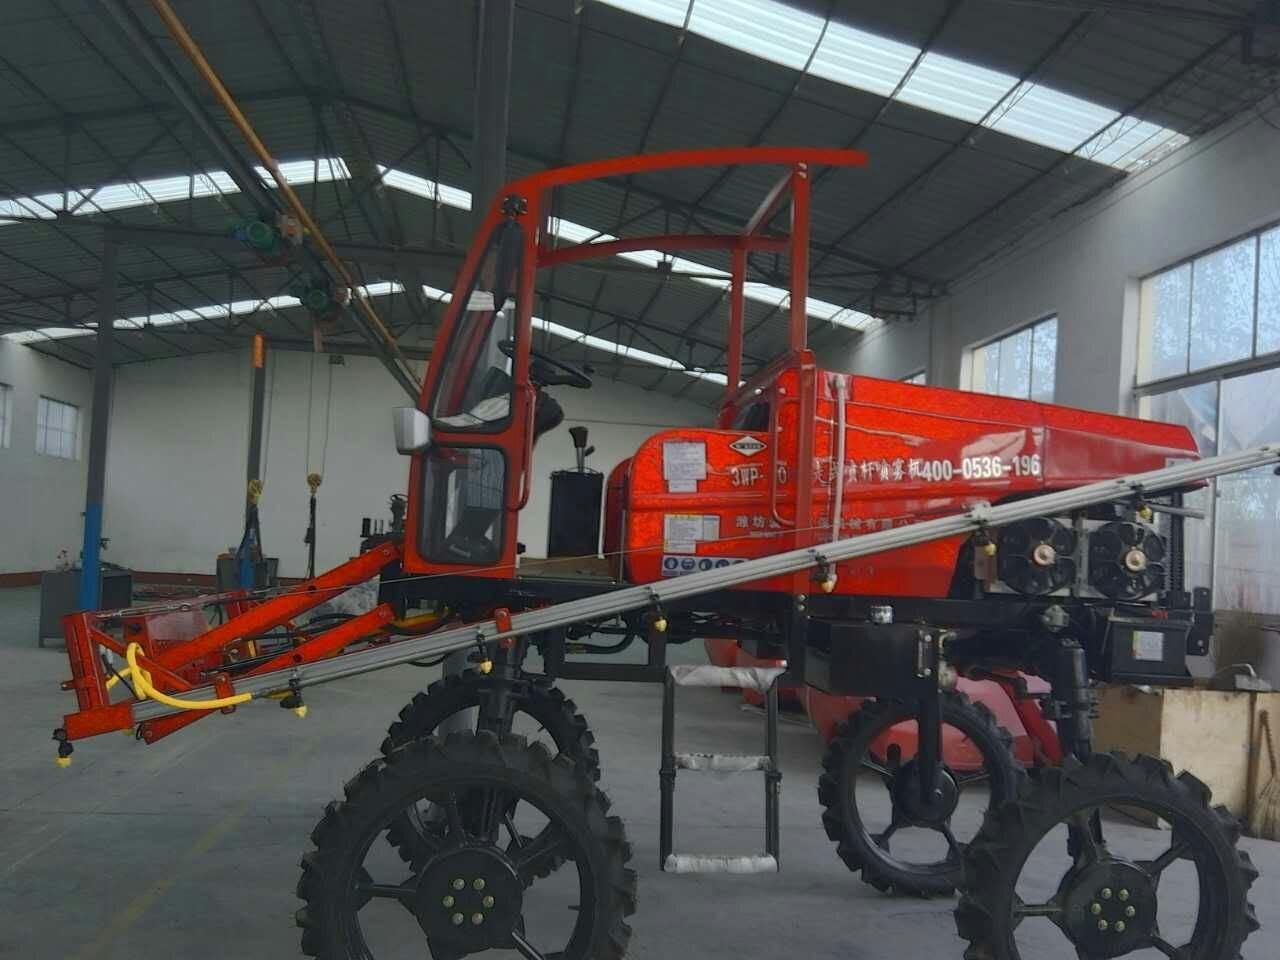 Aidi Brand 4WD Hst Diesel Engine Machine Spraying for Rice\Paddy\Soybean\Corn Field